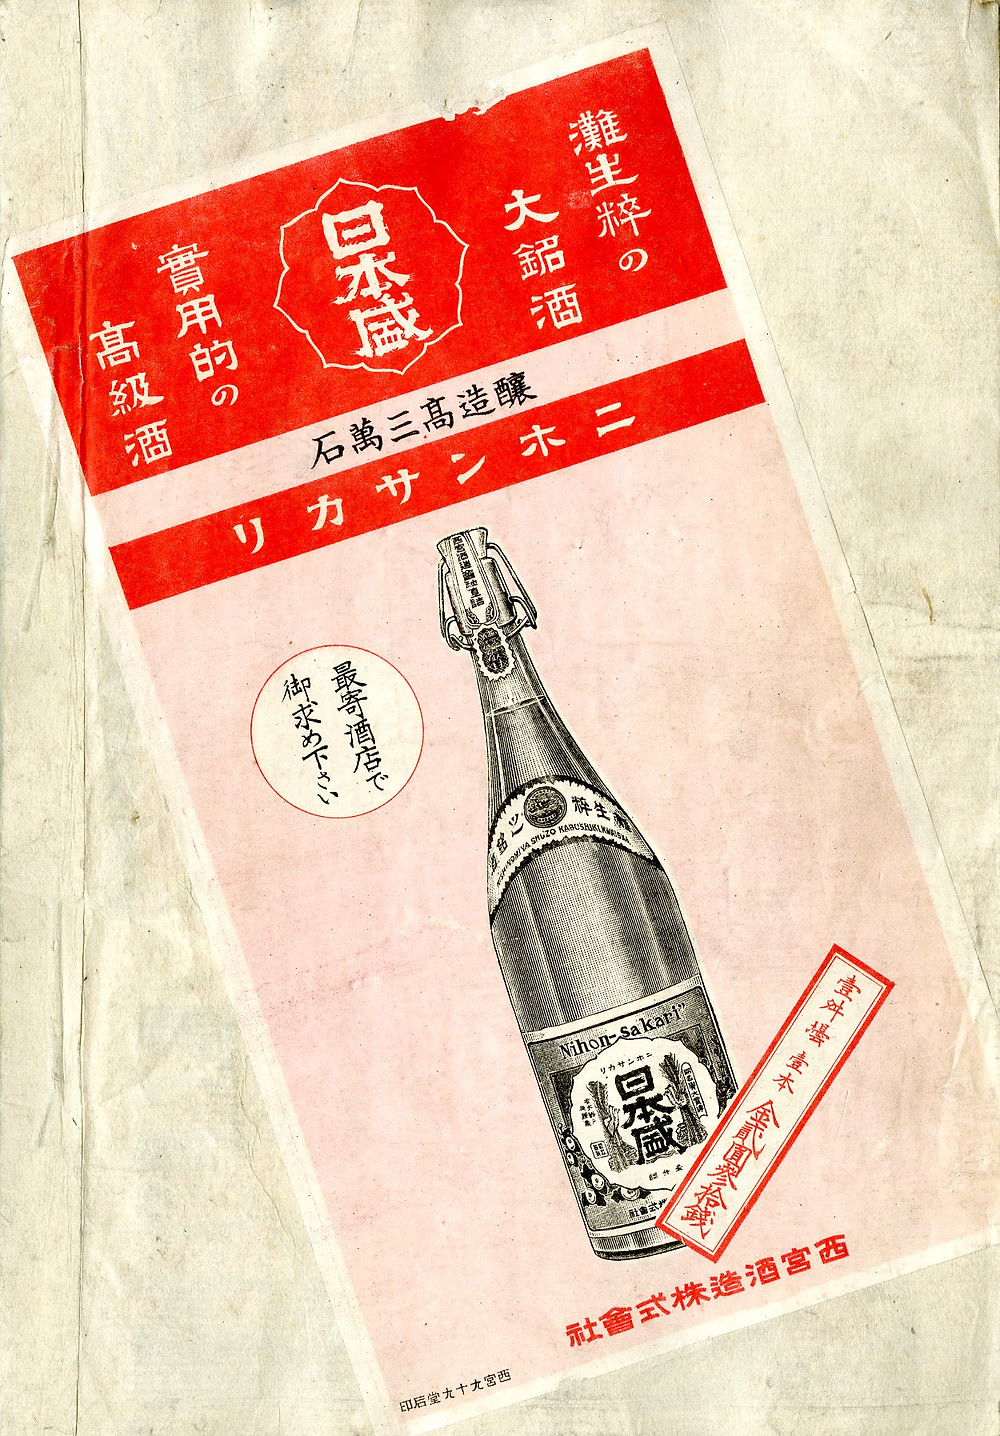 Japanese label